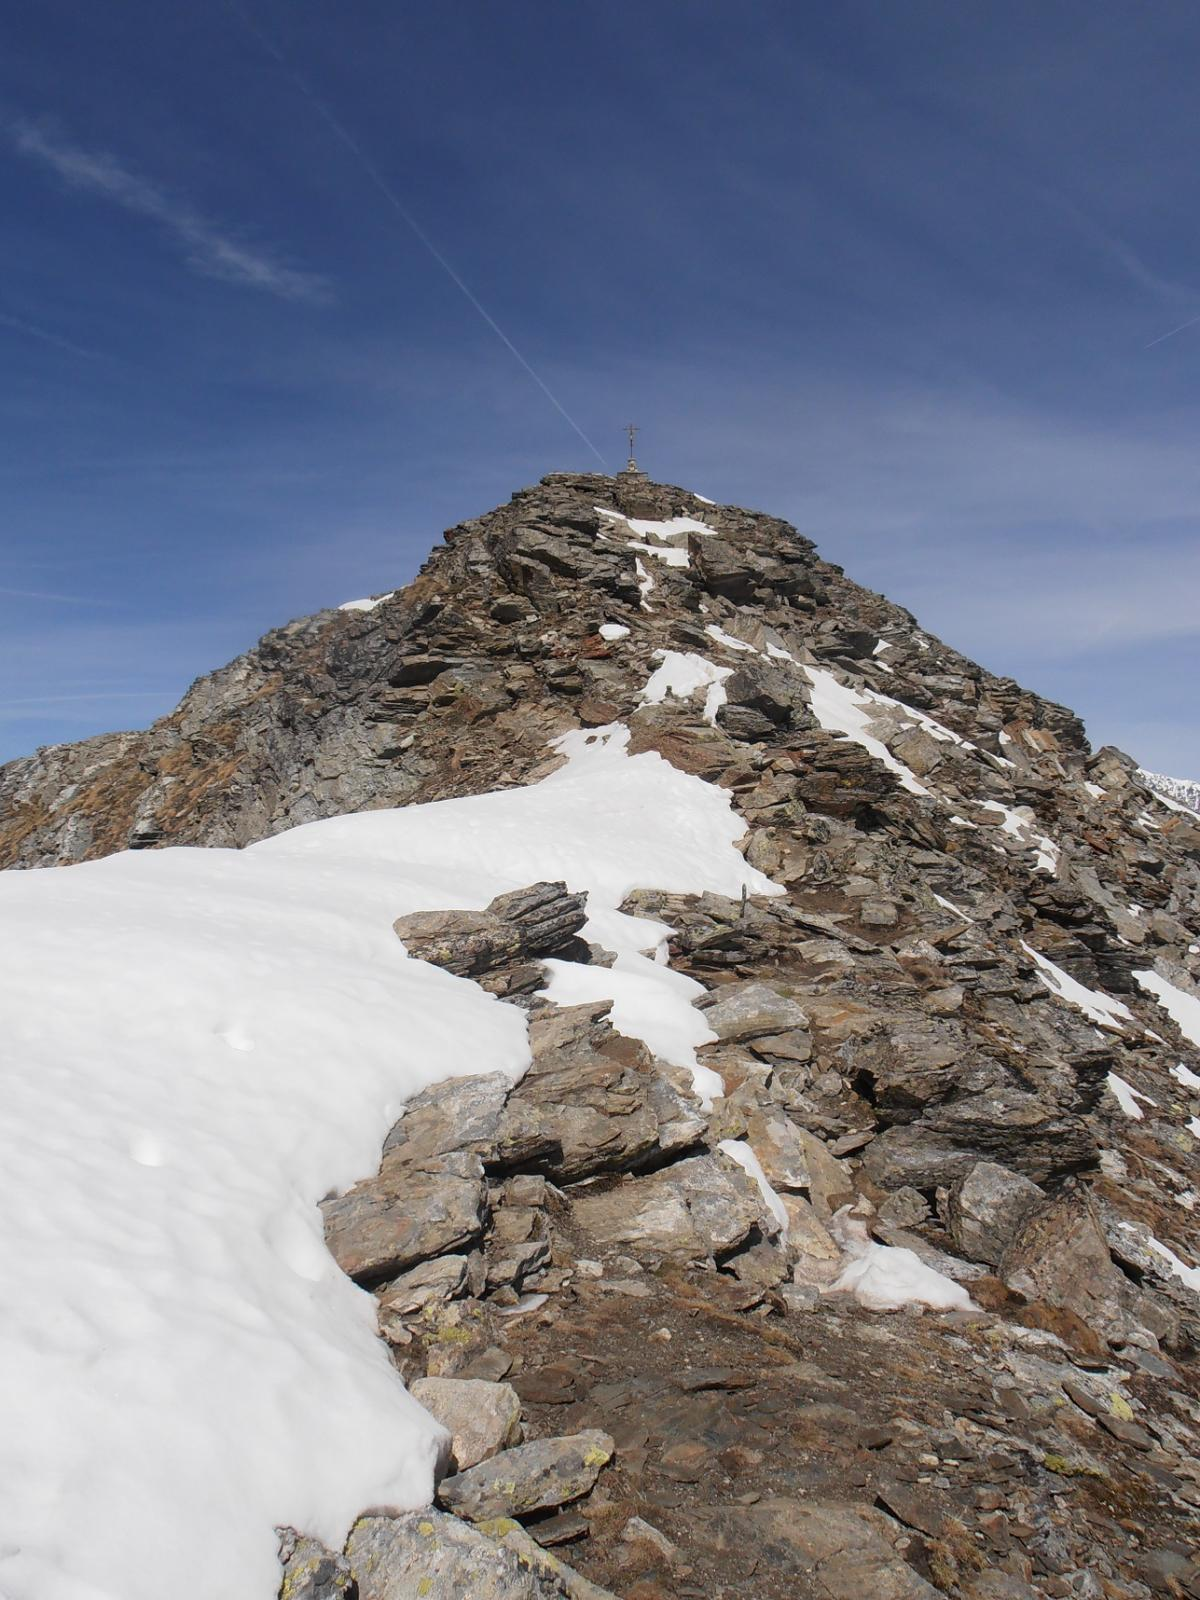 06 - l'arrivo in cima, nevai aggirabili